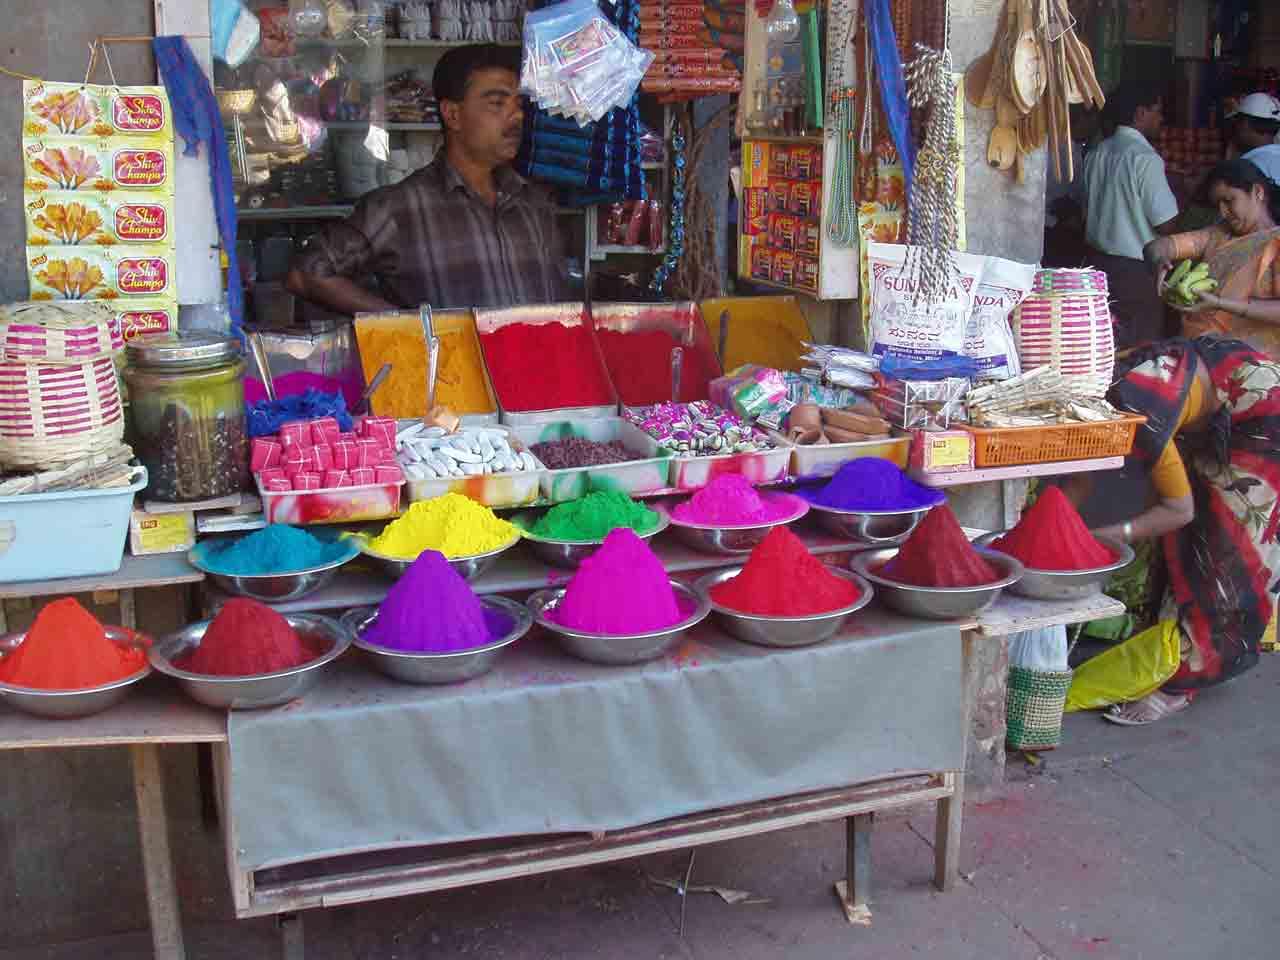 Exuberant display of colors